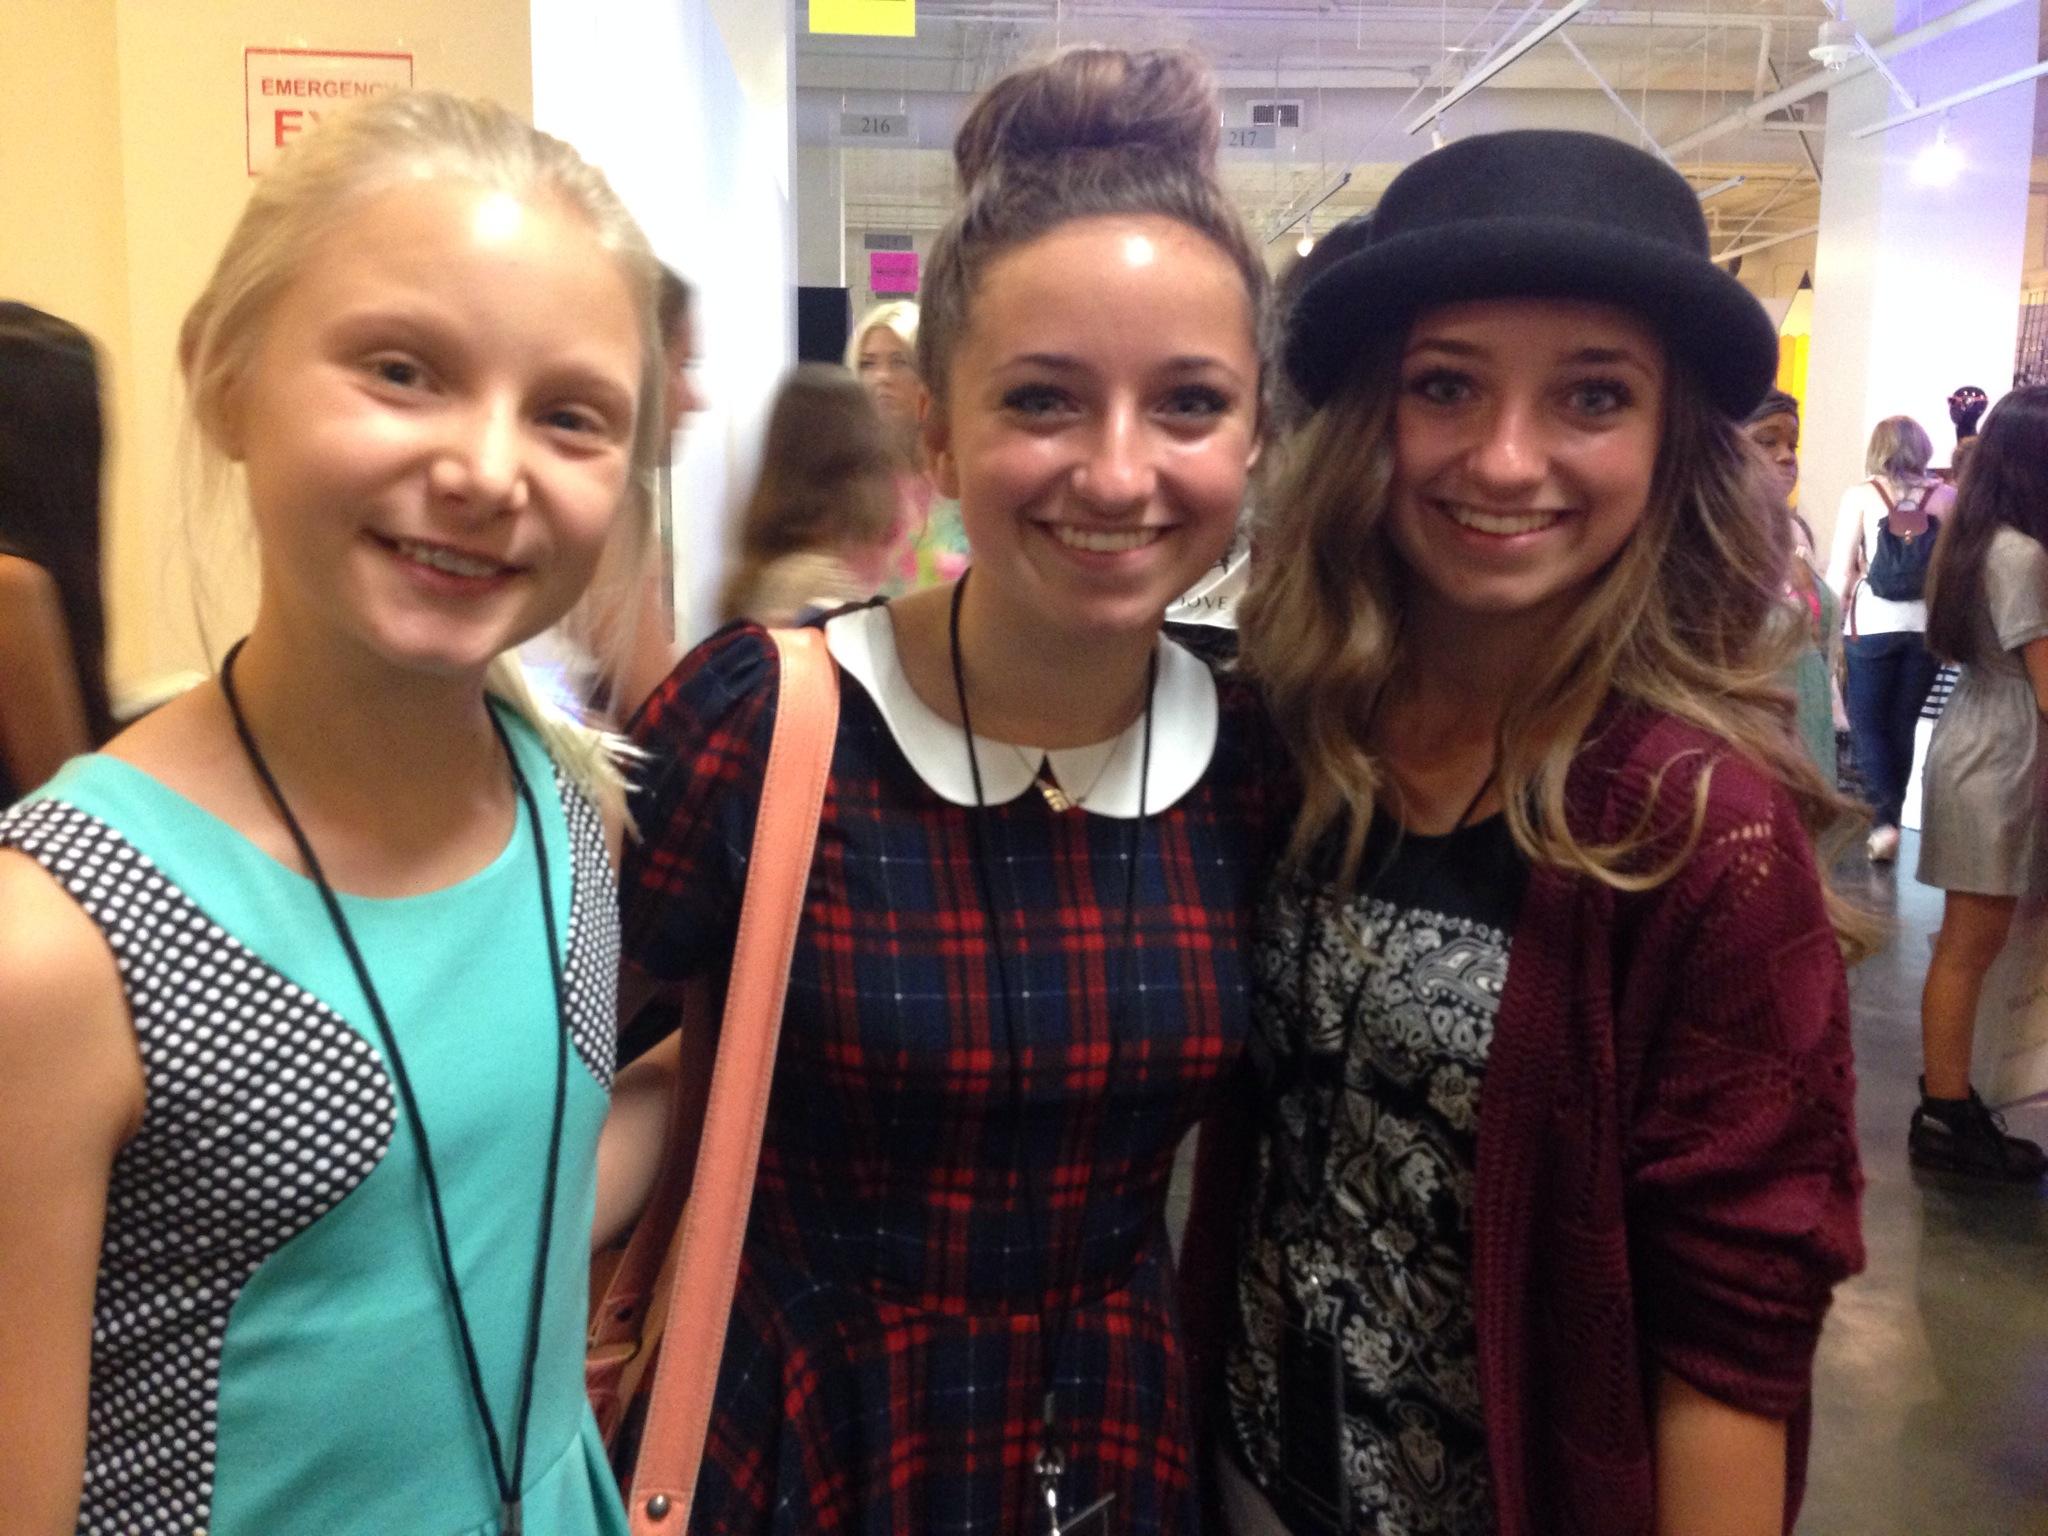 Peachy Meet Brooklyn Bailey And Mindy Mcknight From Cute Girls Hairstyles For Women Draintrainus